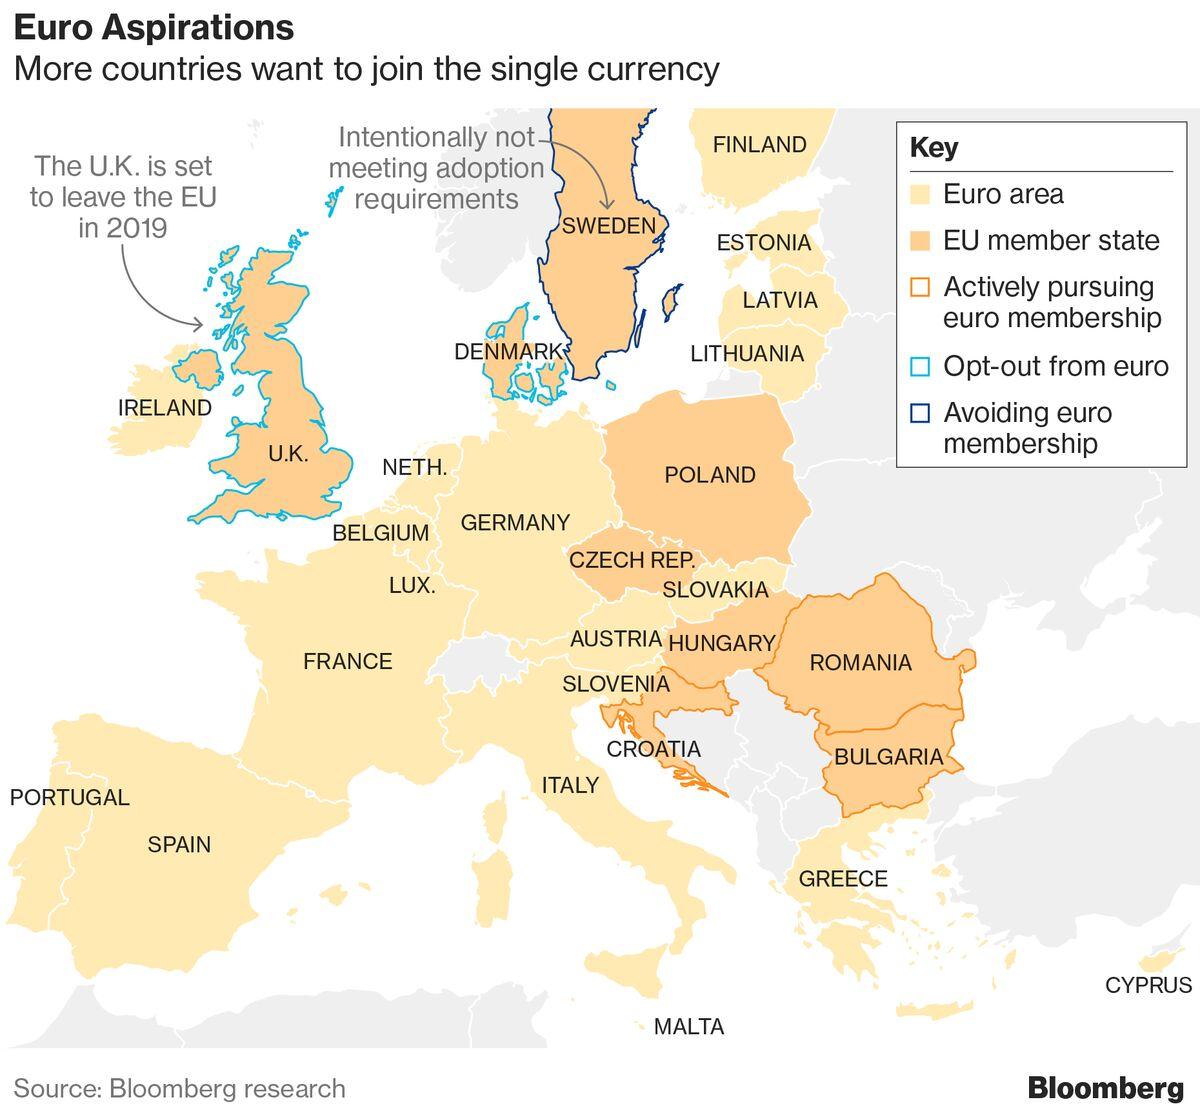 Merkel Supports Croatia's Plans to Join Euro, Schengen Area